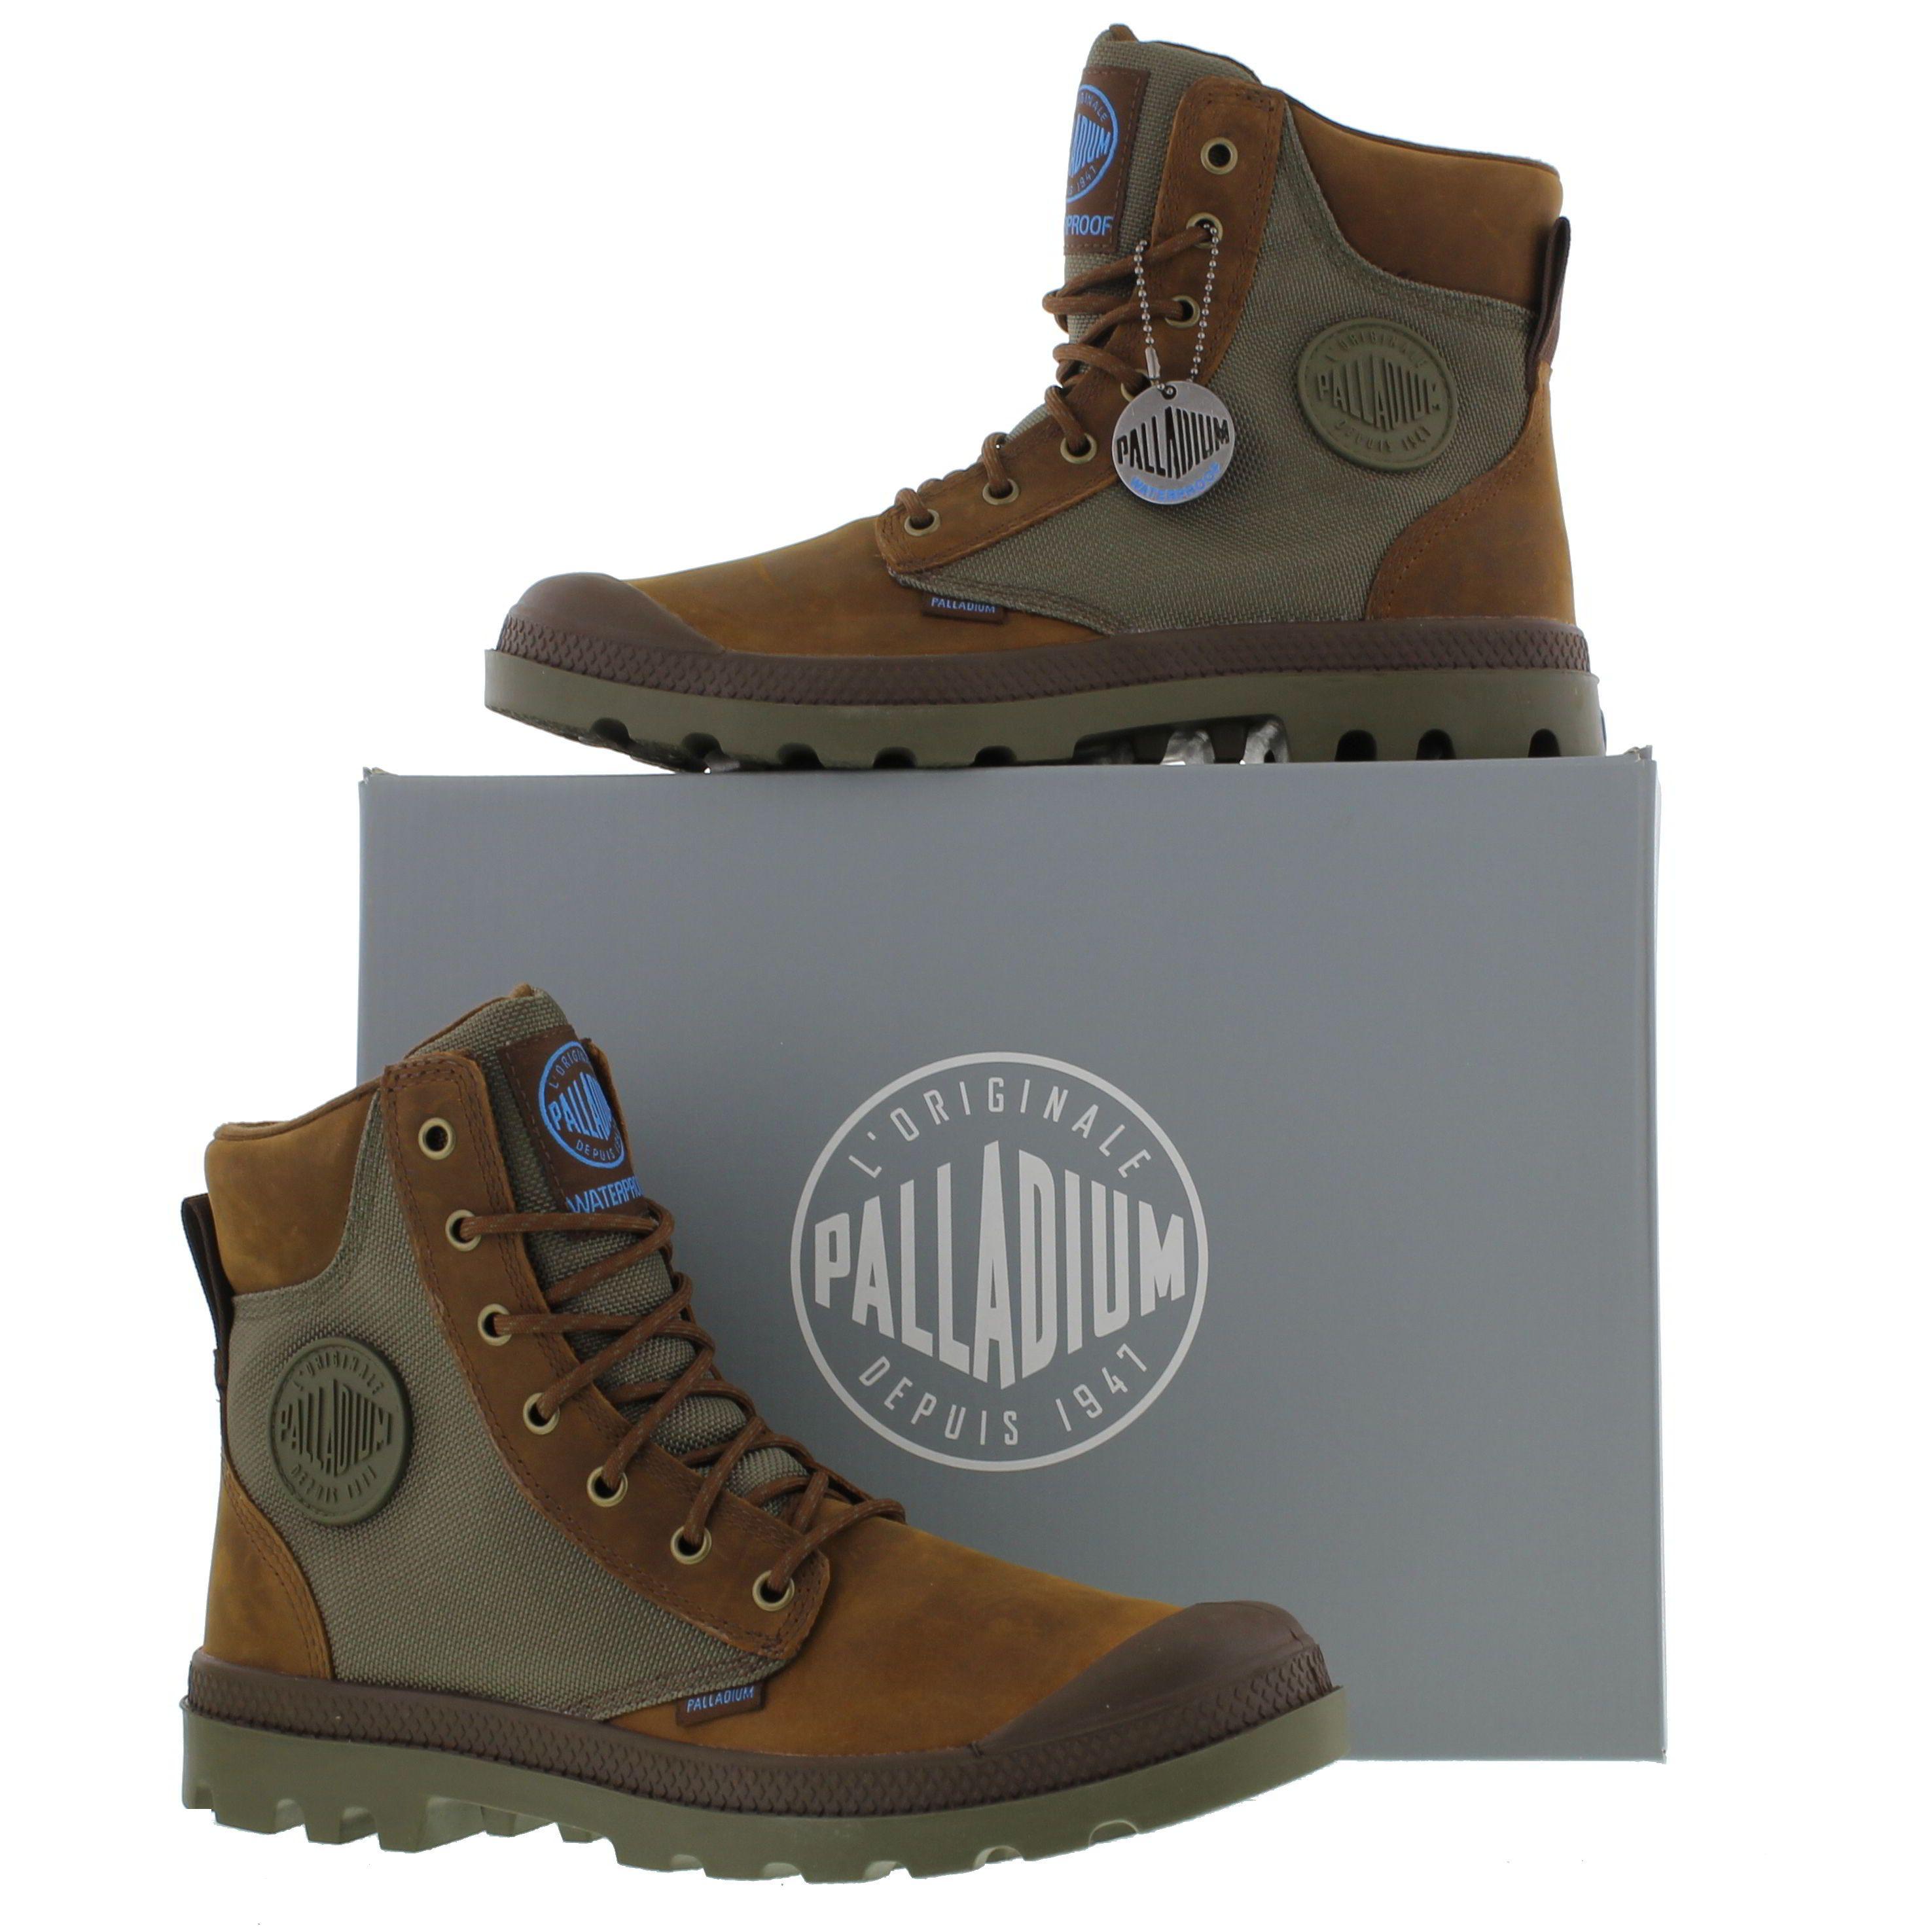 Palladium Mens Pampa Sport Cuff Waterproof Boots - Brown Green